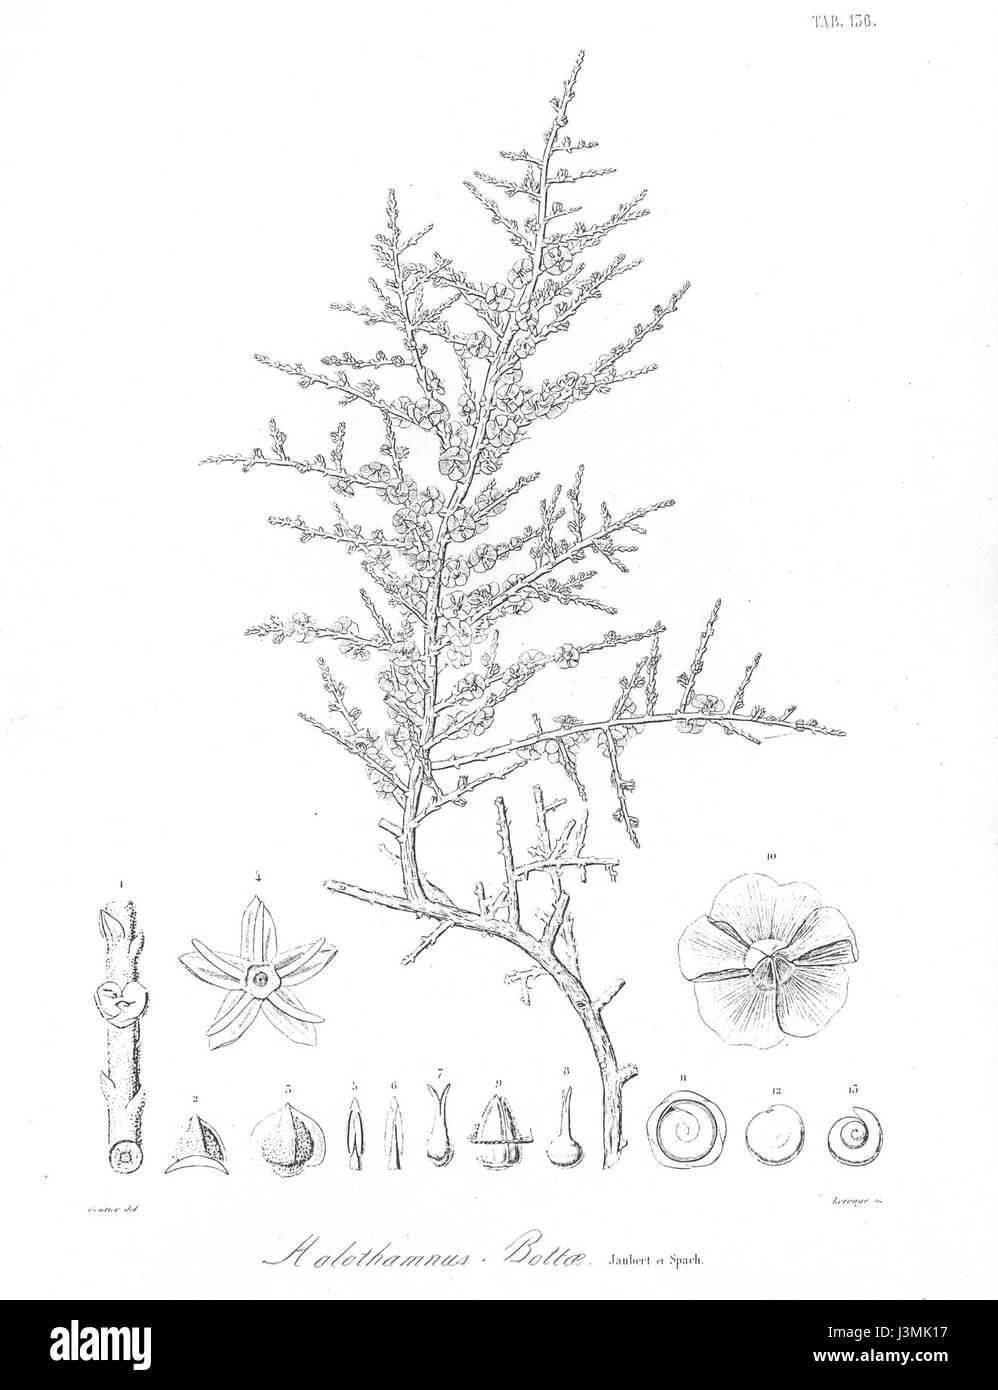 Halothamnus Bottae von Jaubert & Spach Stockbild